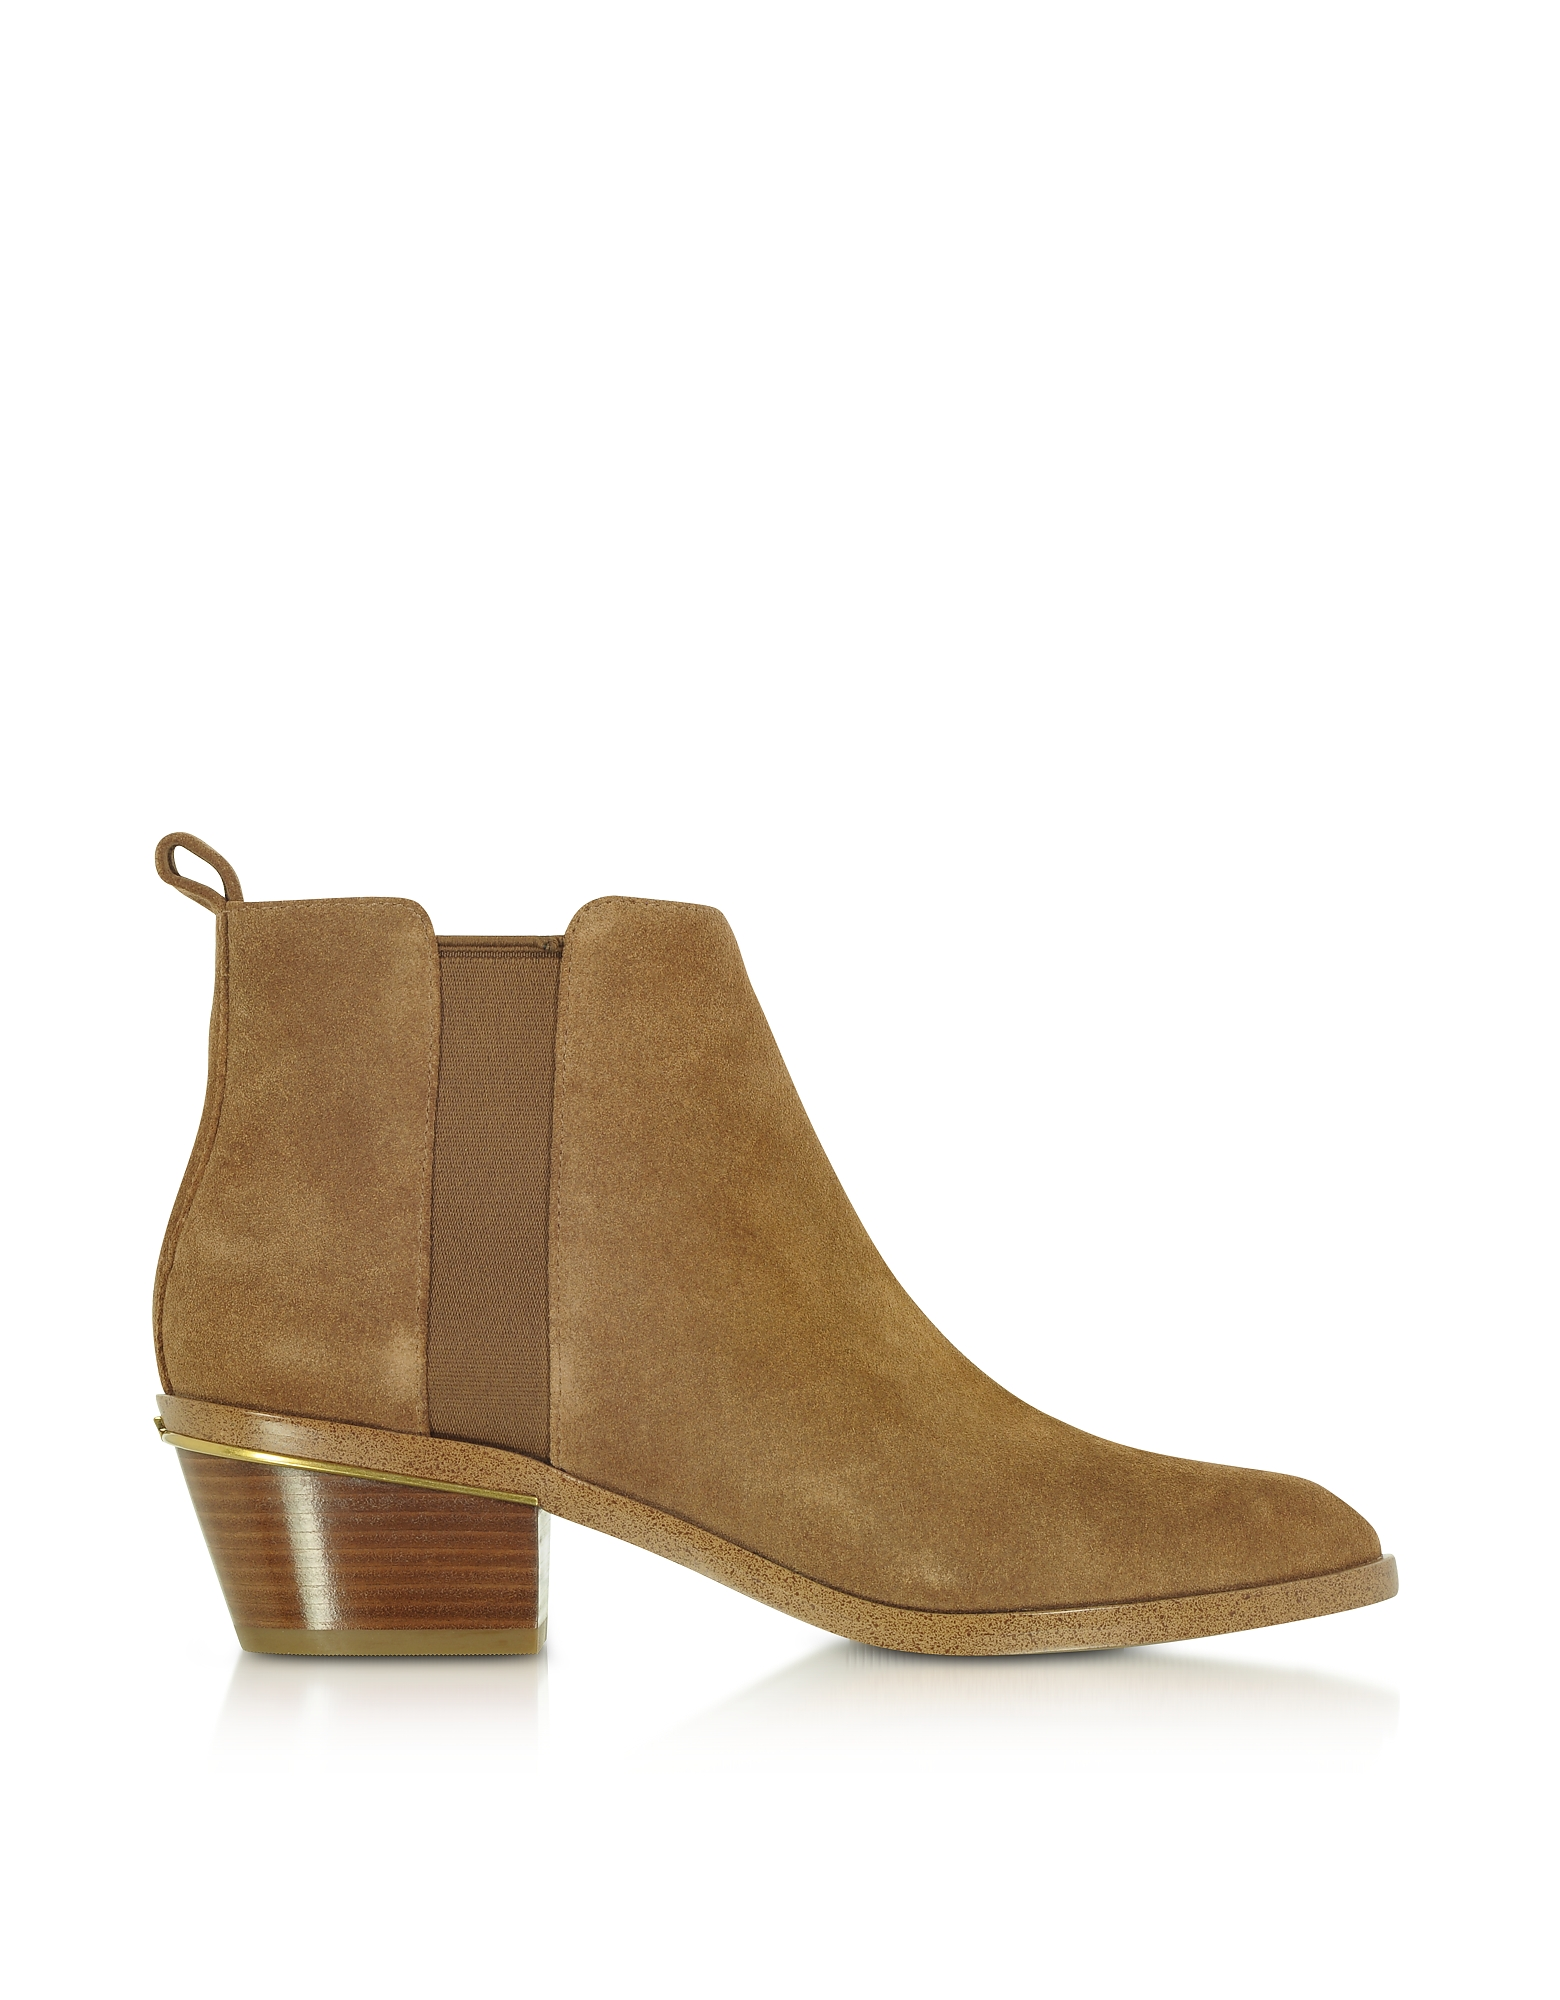 Michael Kors Shoes, Crosby Dark Caramel Suede Mid-Heel Booties